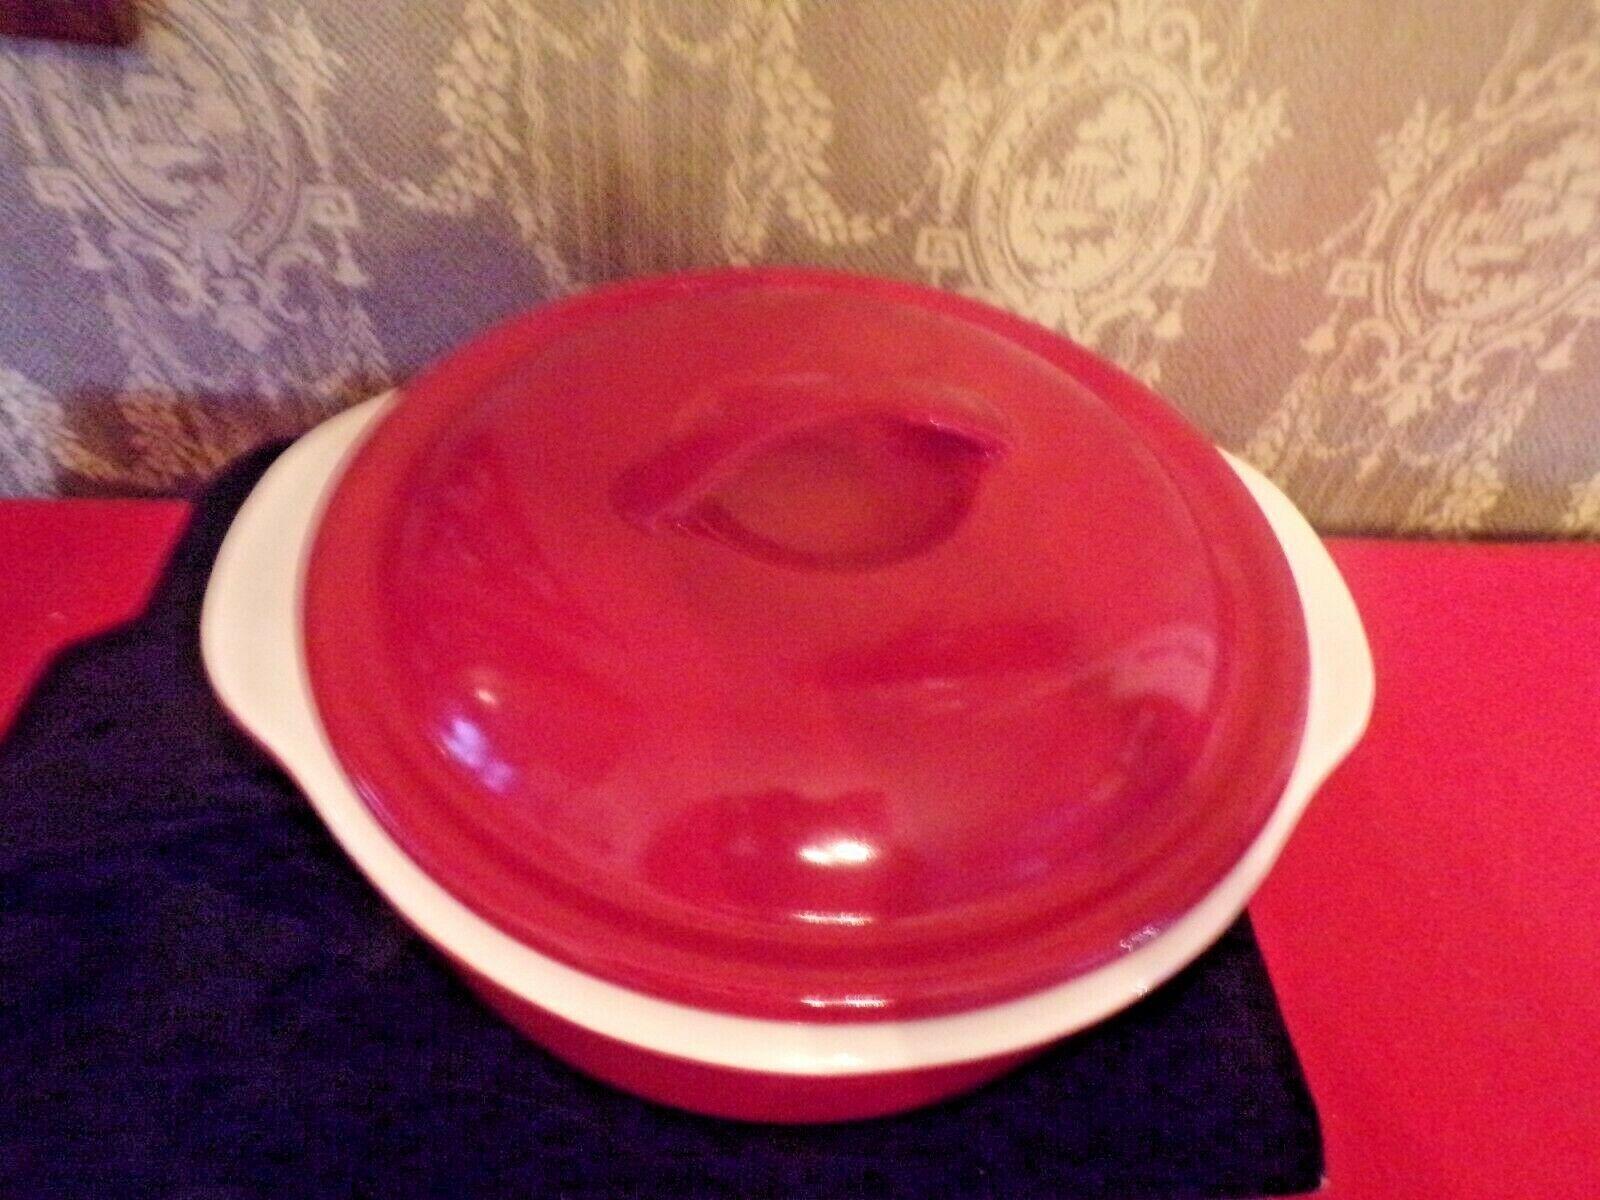 Corelle Coordinates 2 1/2qt Red stoneware casserole dish with lid - $34.65